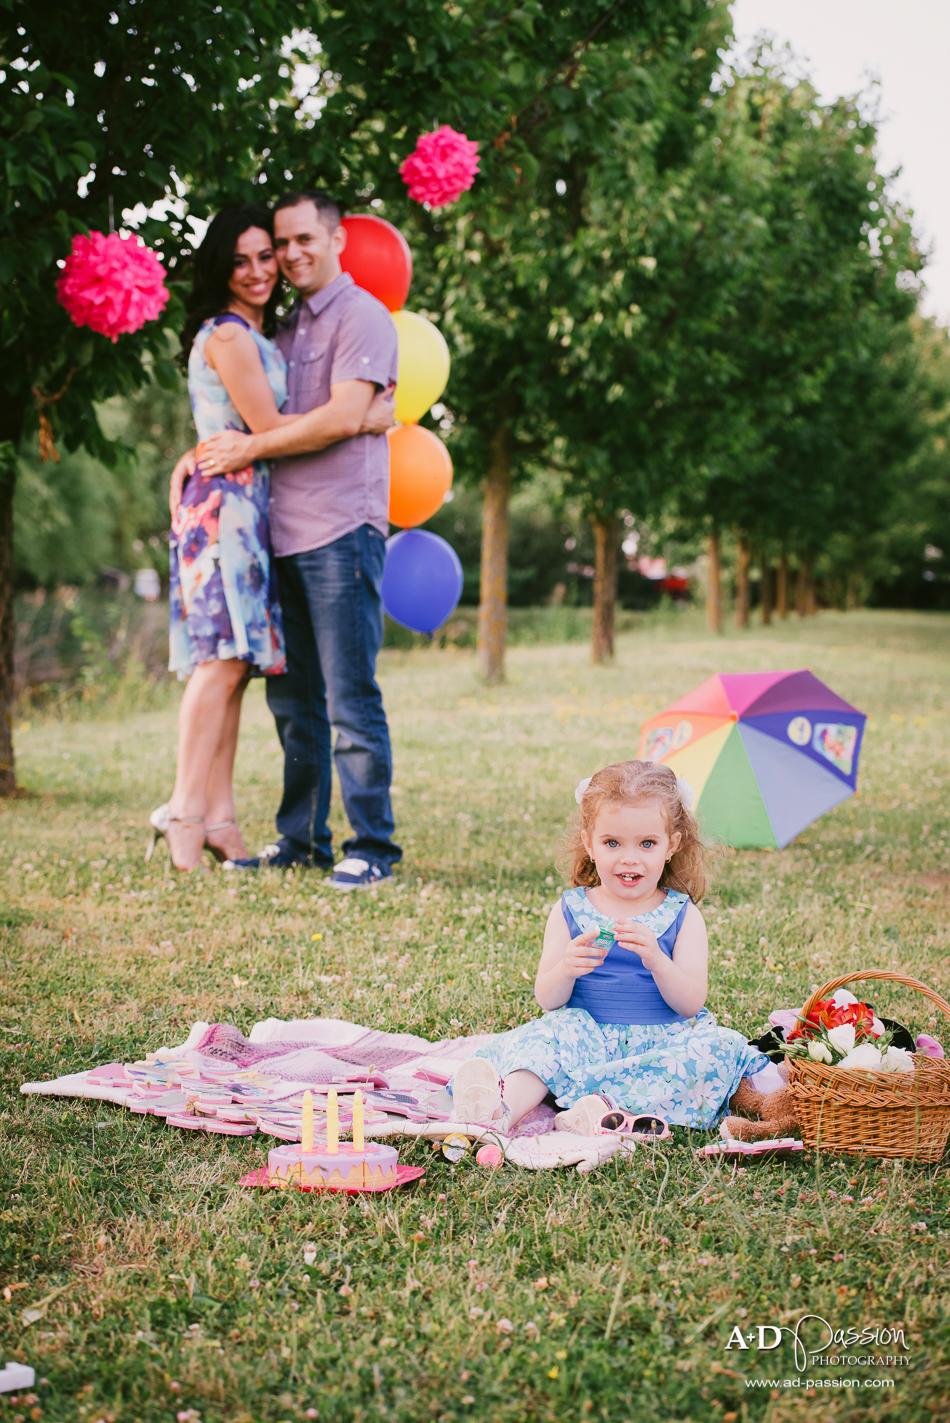 AD Passion Photography | 20150622_sedinta-foto-alexaandra-tony-yasena_0024 | Adelin, Dida, fotograf profesionist, fotograf de nunta, fotografie de nunta, fotograf Timisoara, fotograf Craiova, fotograf Bucuresti, fotograf Arad, nunta Timisoara, nunta Arad, nunta Bucuresti, nunta Craiova